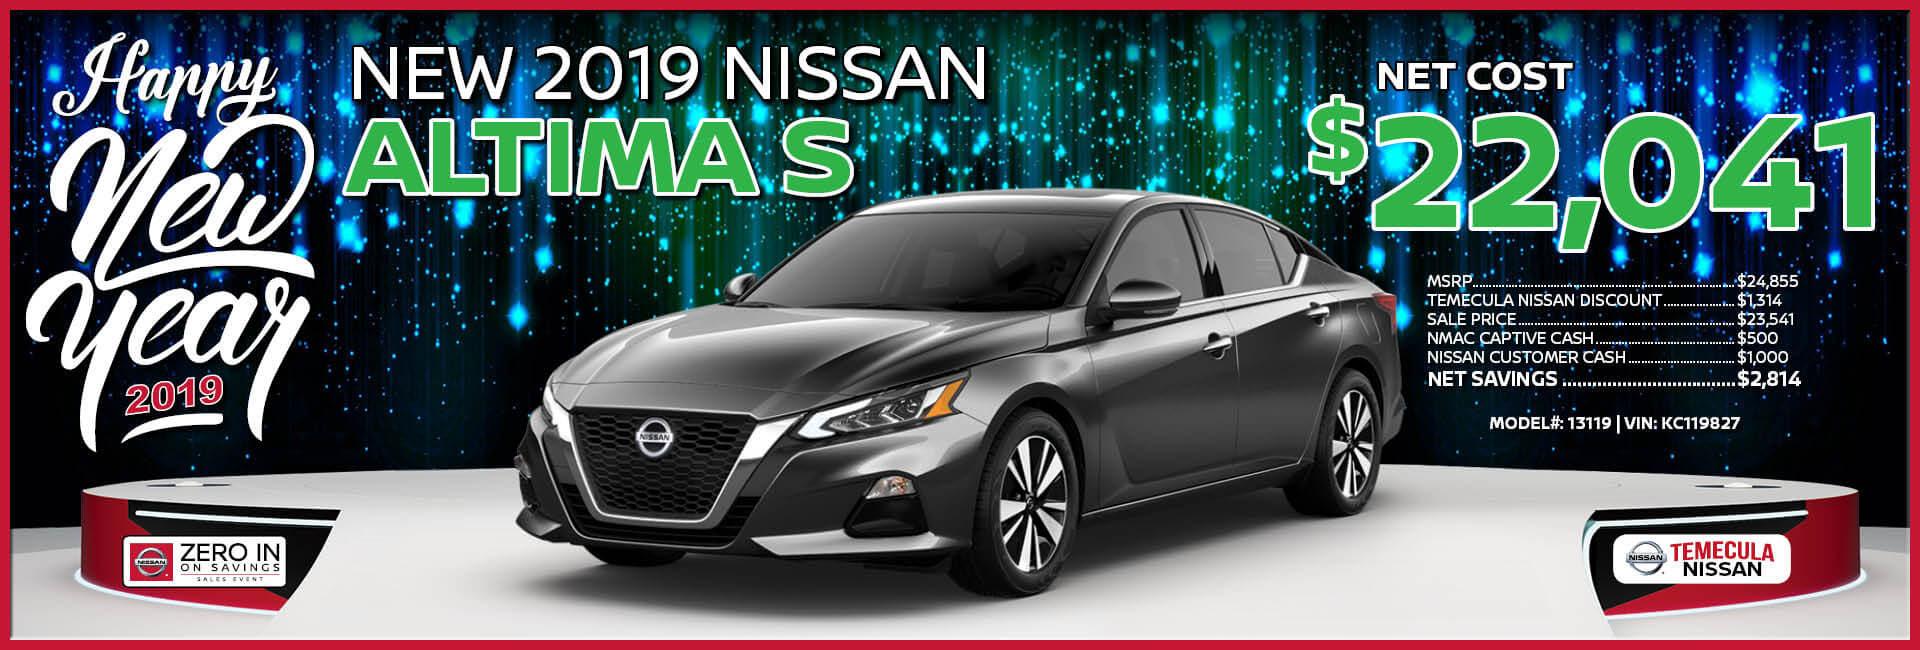 Nissan Altima $22,041